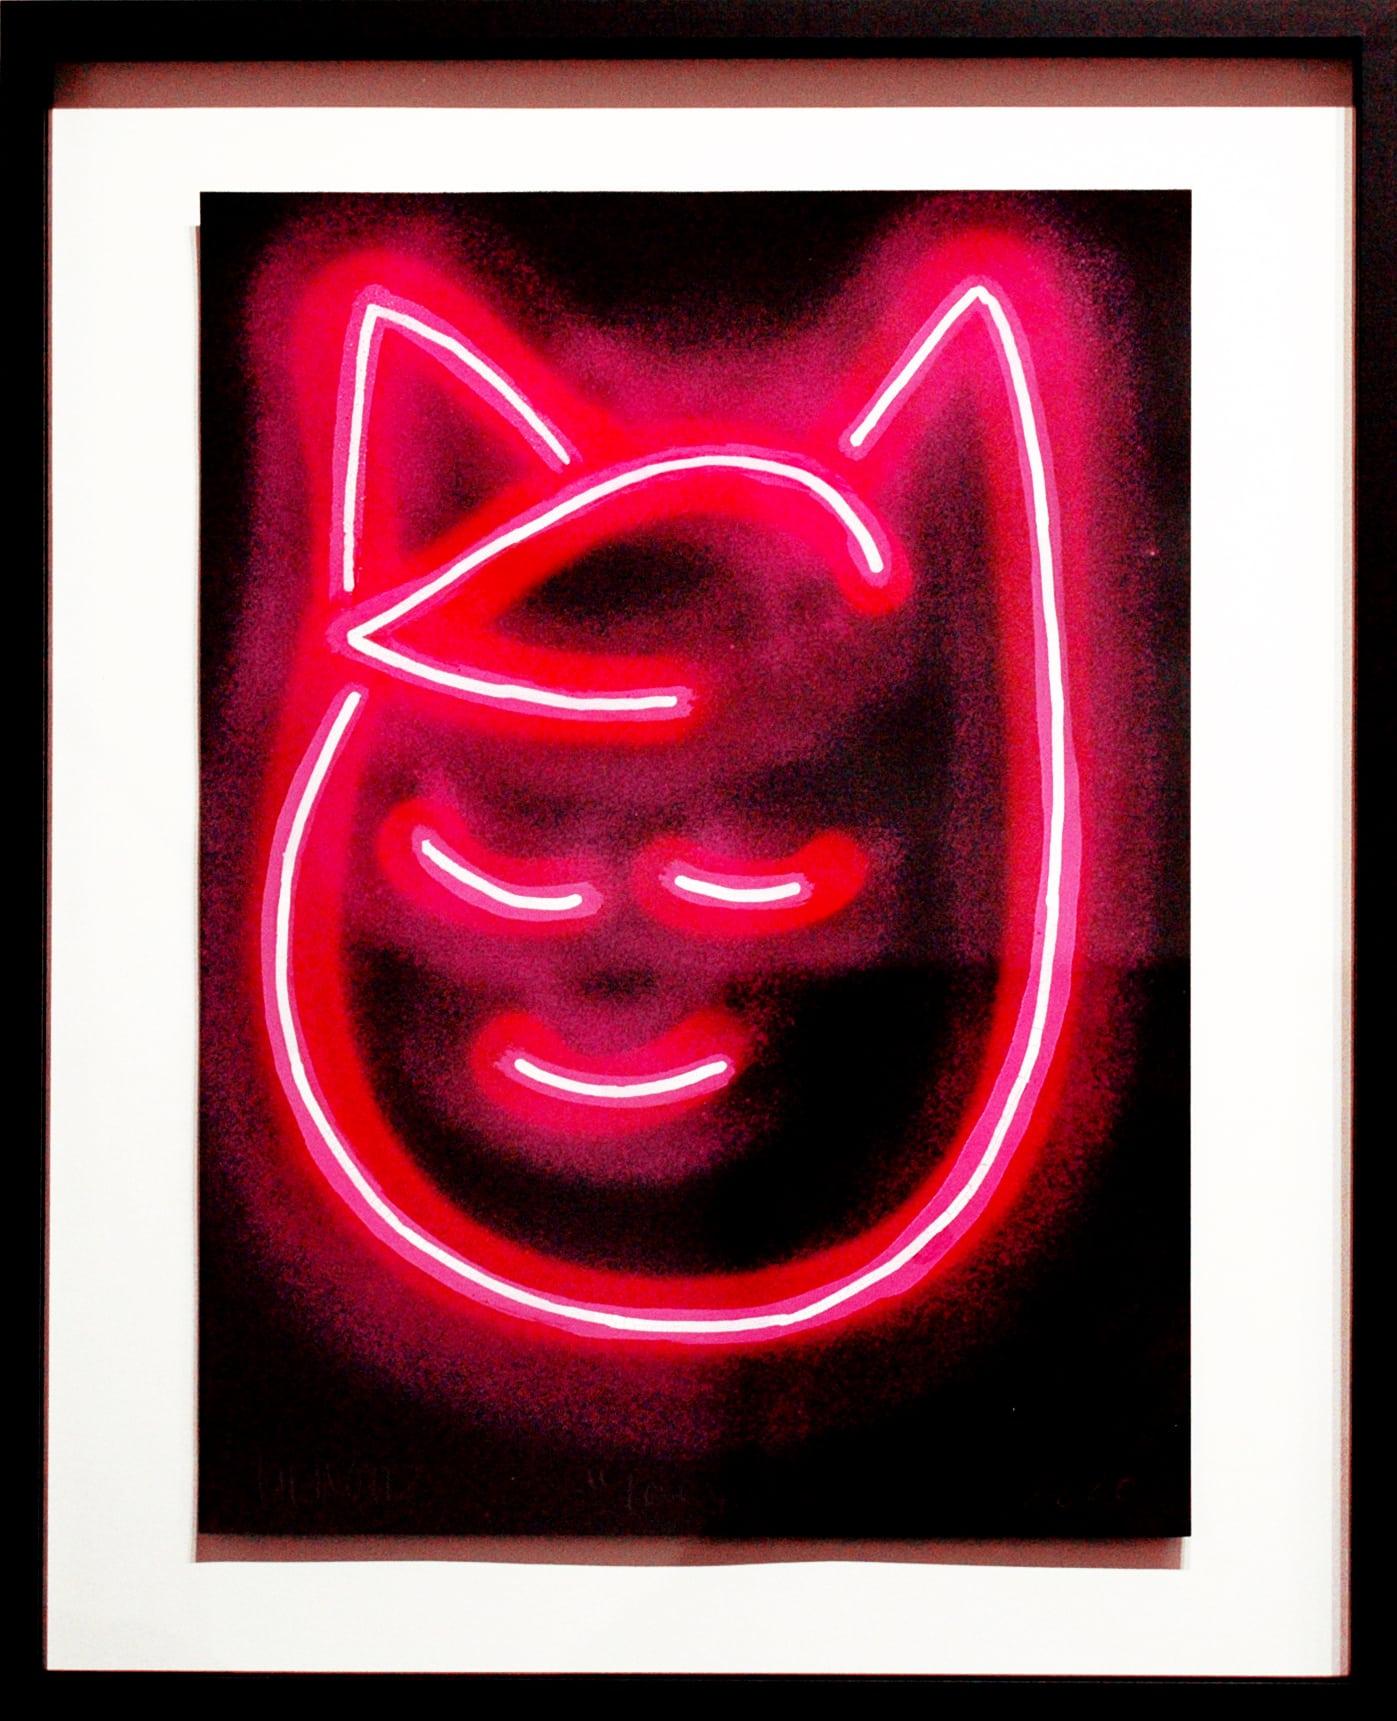 Galerie Art Jingle CHANOIR Love Yourself 2020 Encadrement